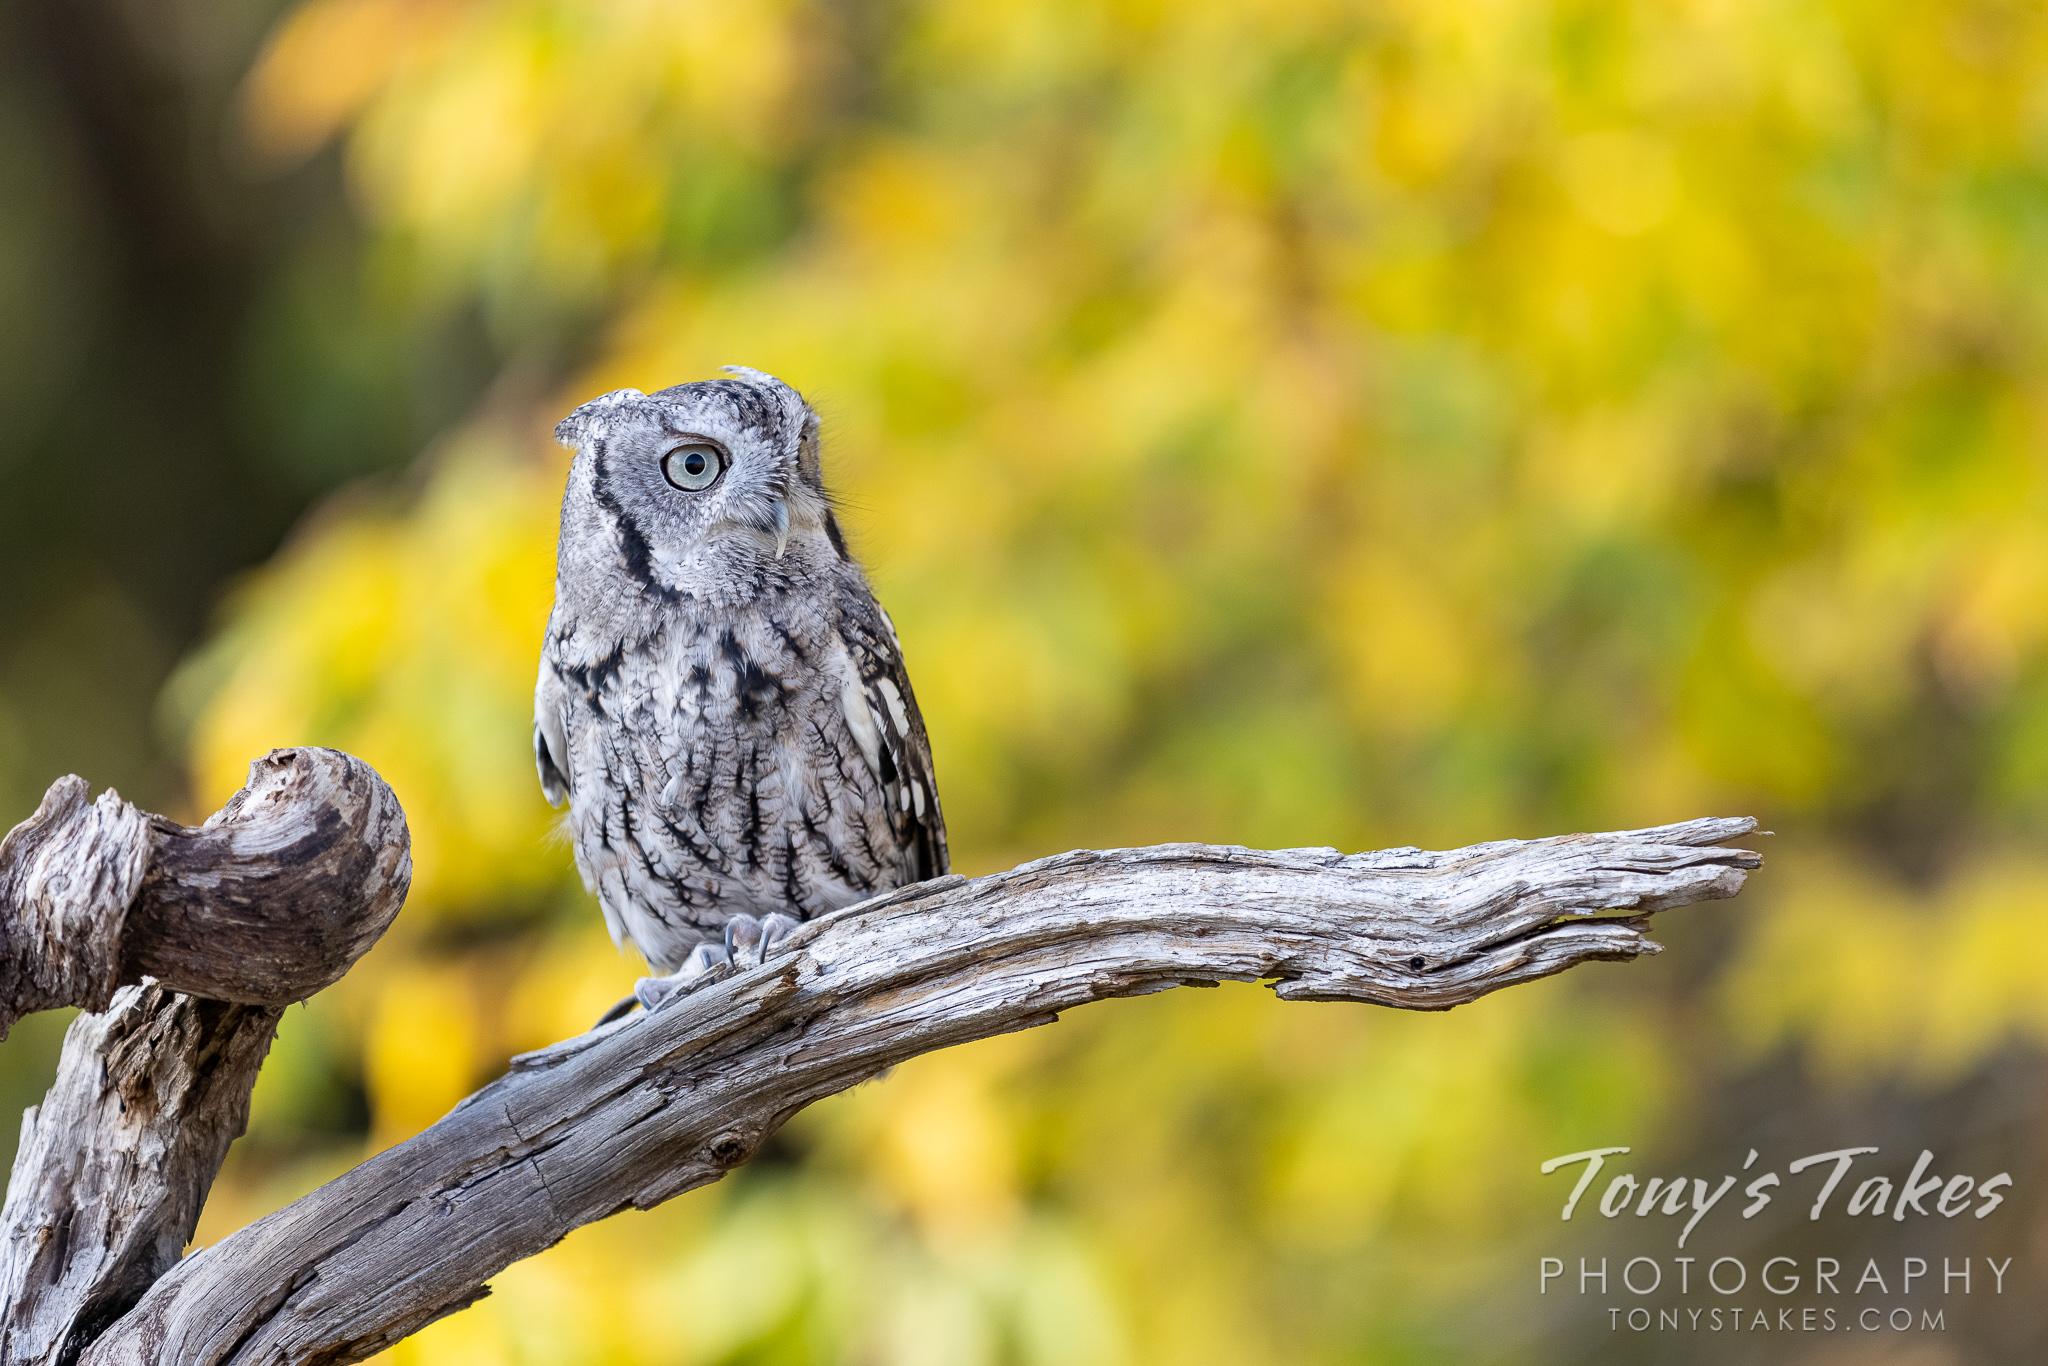 Screech owl posing with fall foliage